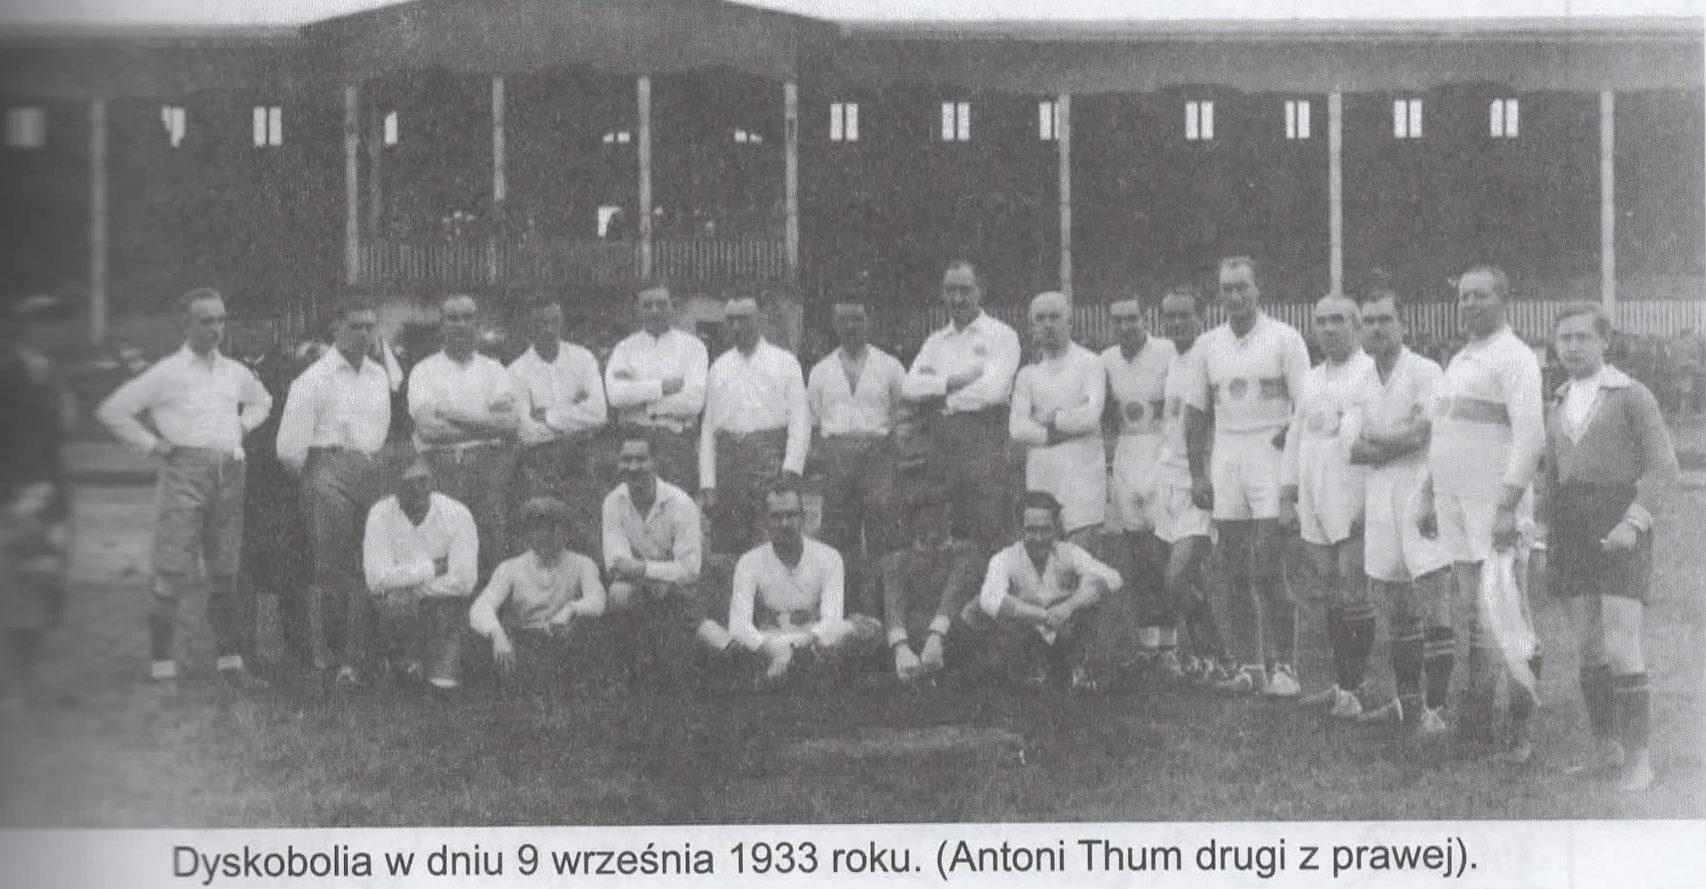 Antoni Thum, Prezes Dyskobolii 1932-1935